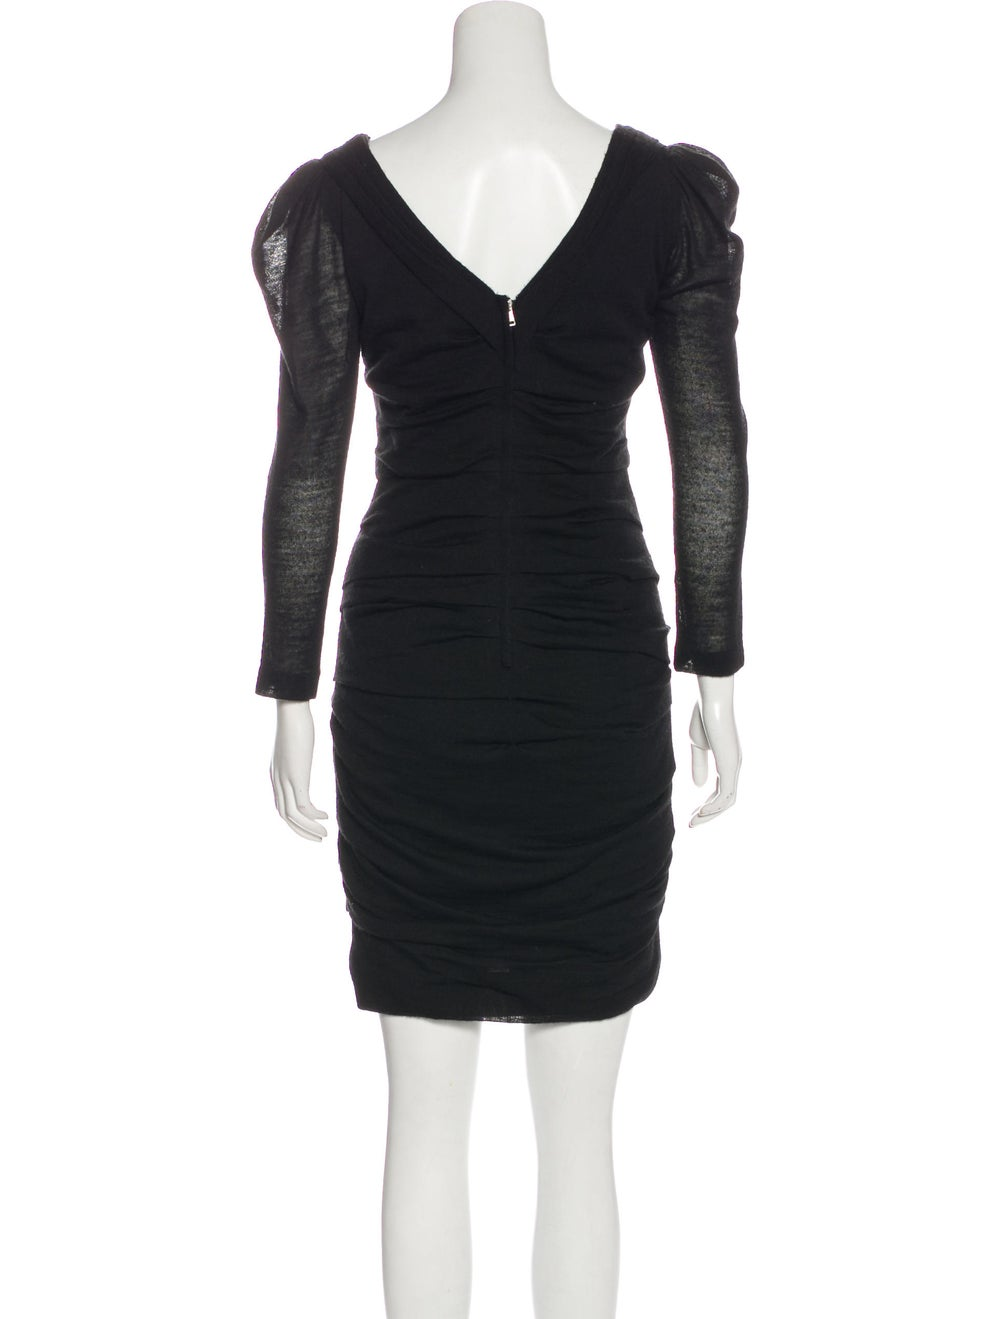 Dolce & Gabbana Long Sleeve Sweater Dress Black - image 3